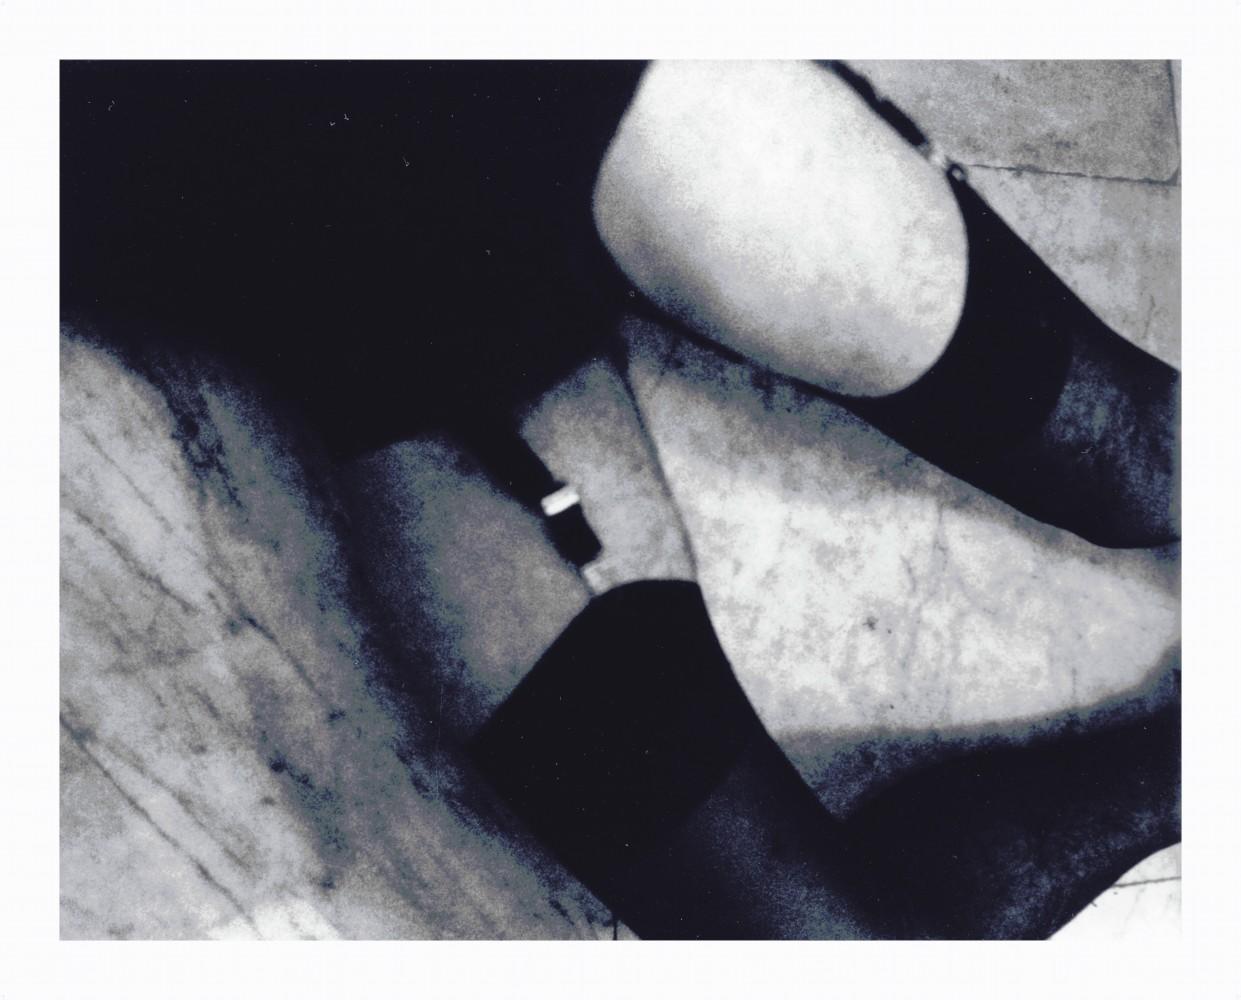 <div class=&#34;artist&#34;><strong>ULAY</strong></div> 1943 - <div class=&#34;title&#34;><em>Death of a Transvestite</em>, 1973</div> <div class=&#34;medium&#34;>Digital print on Hahnemühle Baryta paper<br /> Printed 2018</div> <div class=&#34;dimensions&#34;>Sheet: 78.5 x 100 cm </div> <div class=&#34;edition_details&#34;>Edition 1 of 5 + 1 AP</div>